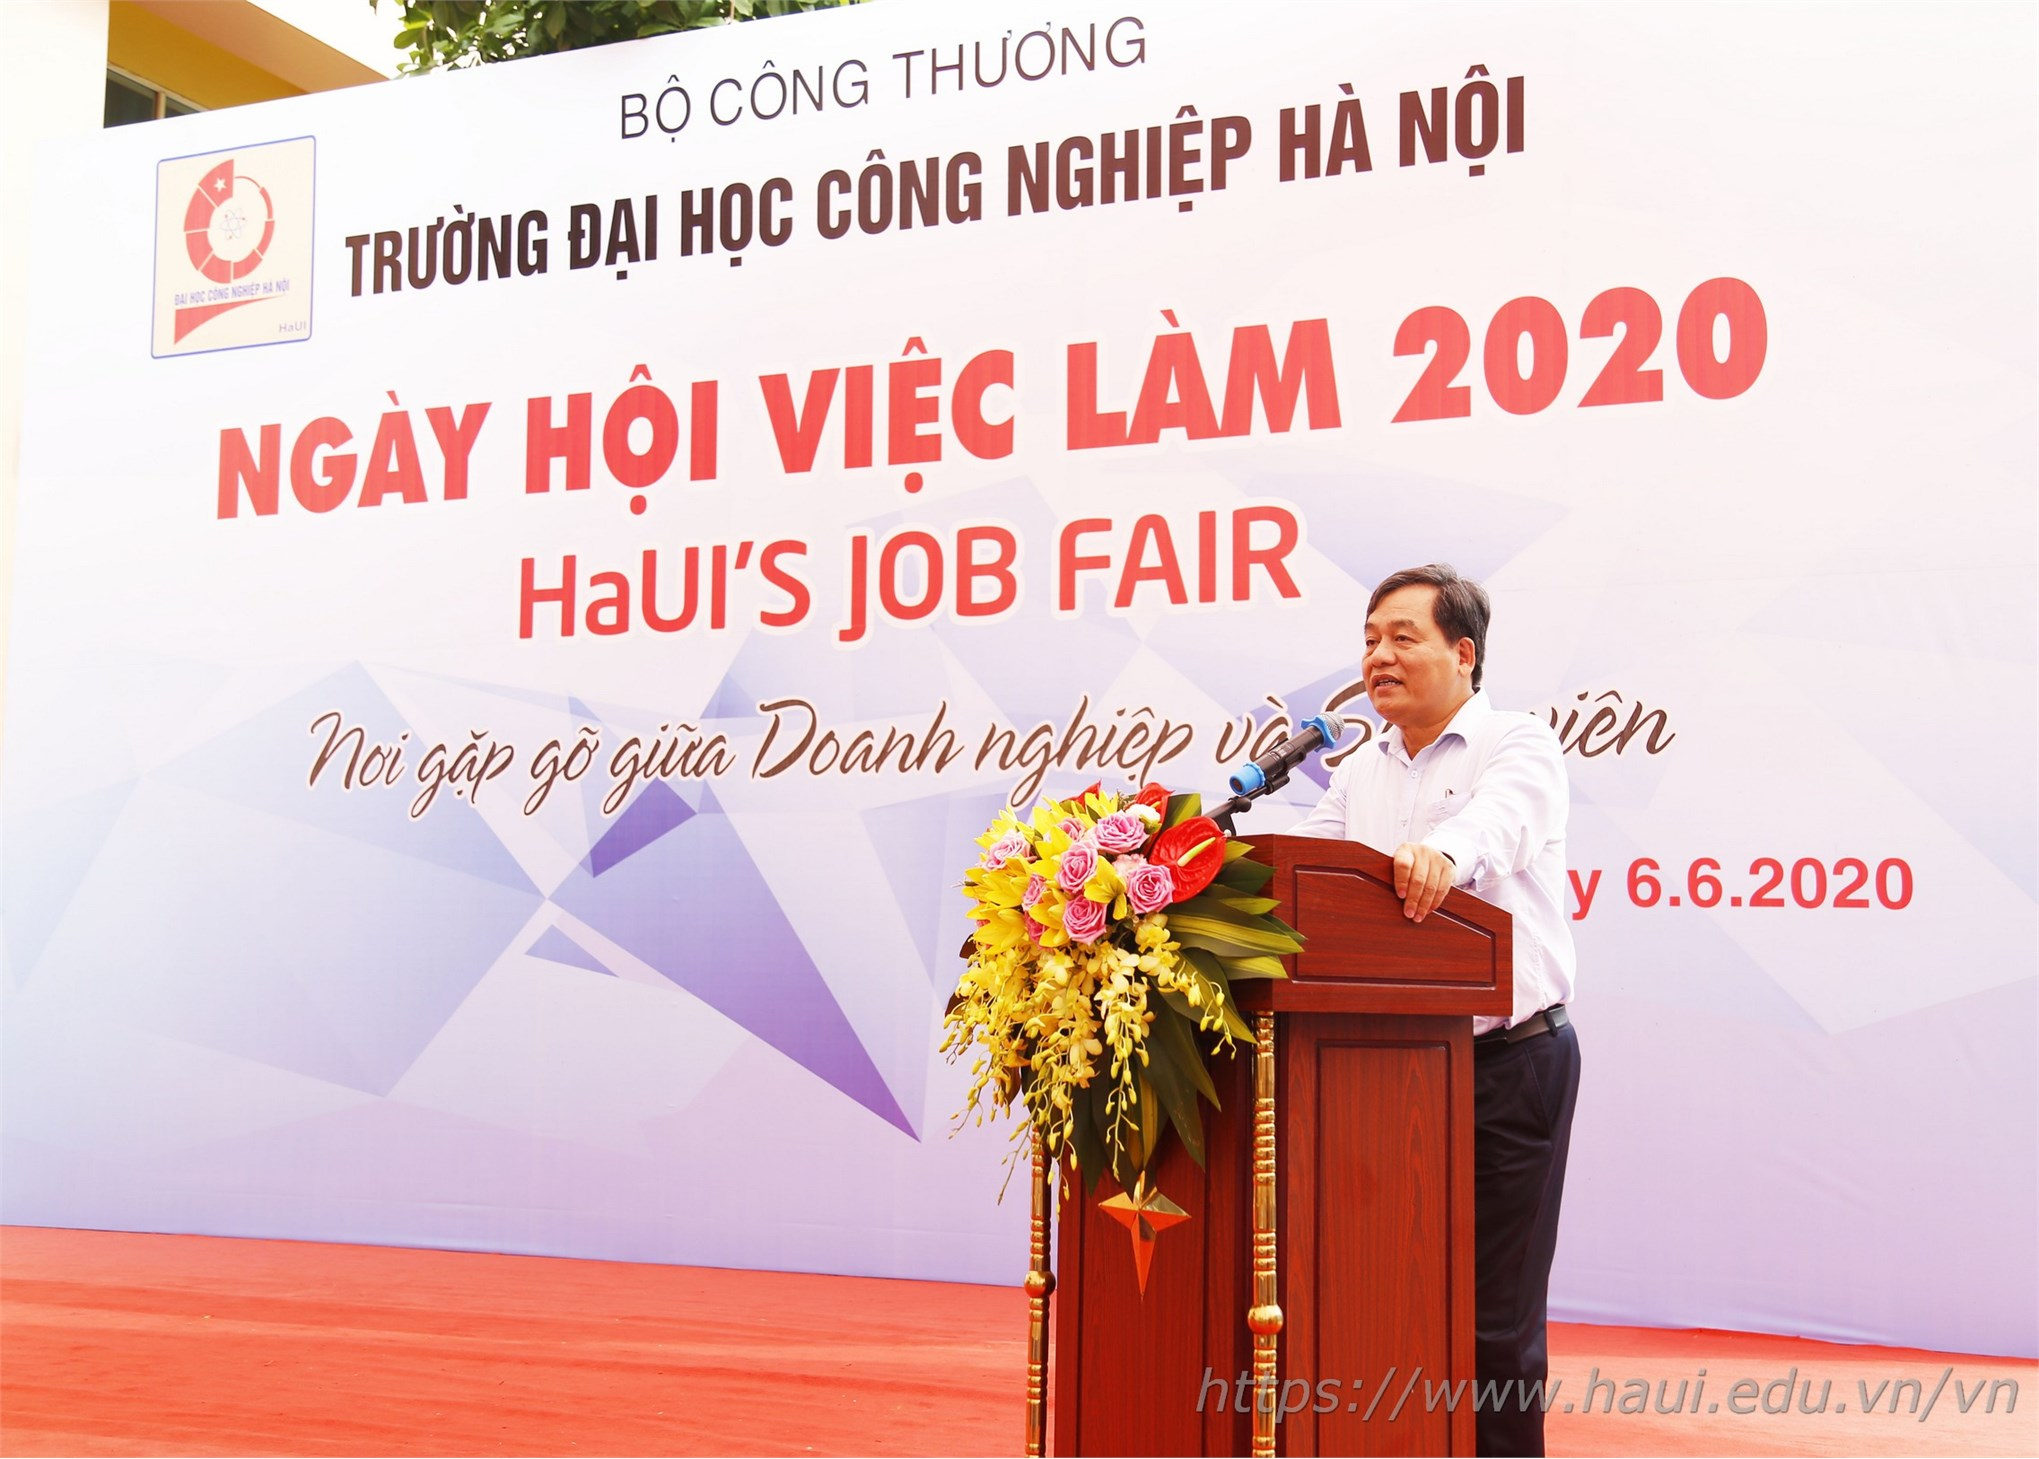 2.000 jobs for students at the HaUI Job Fair 2020